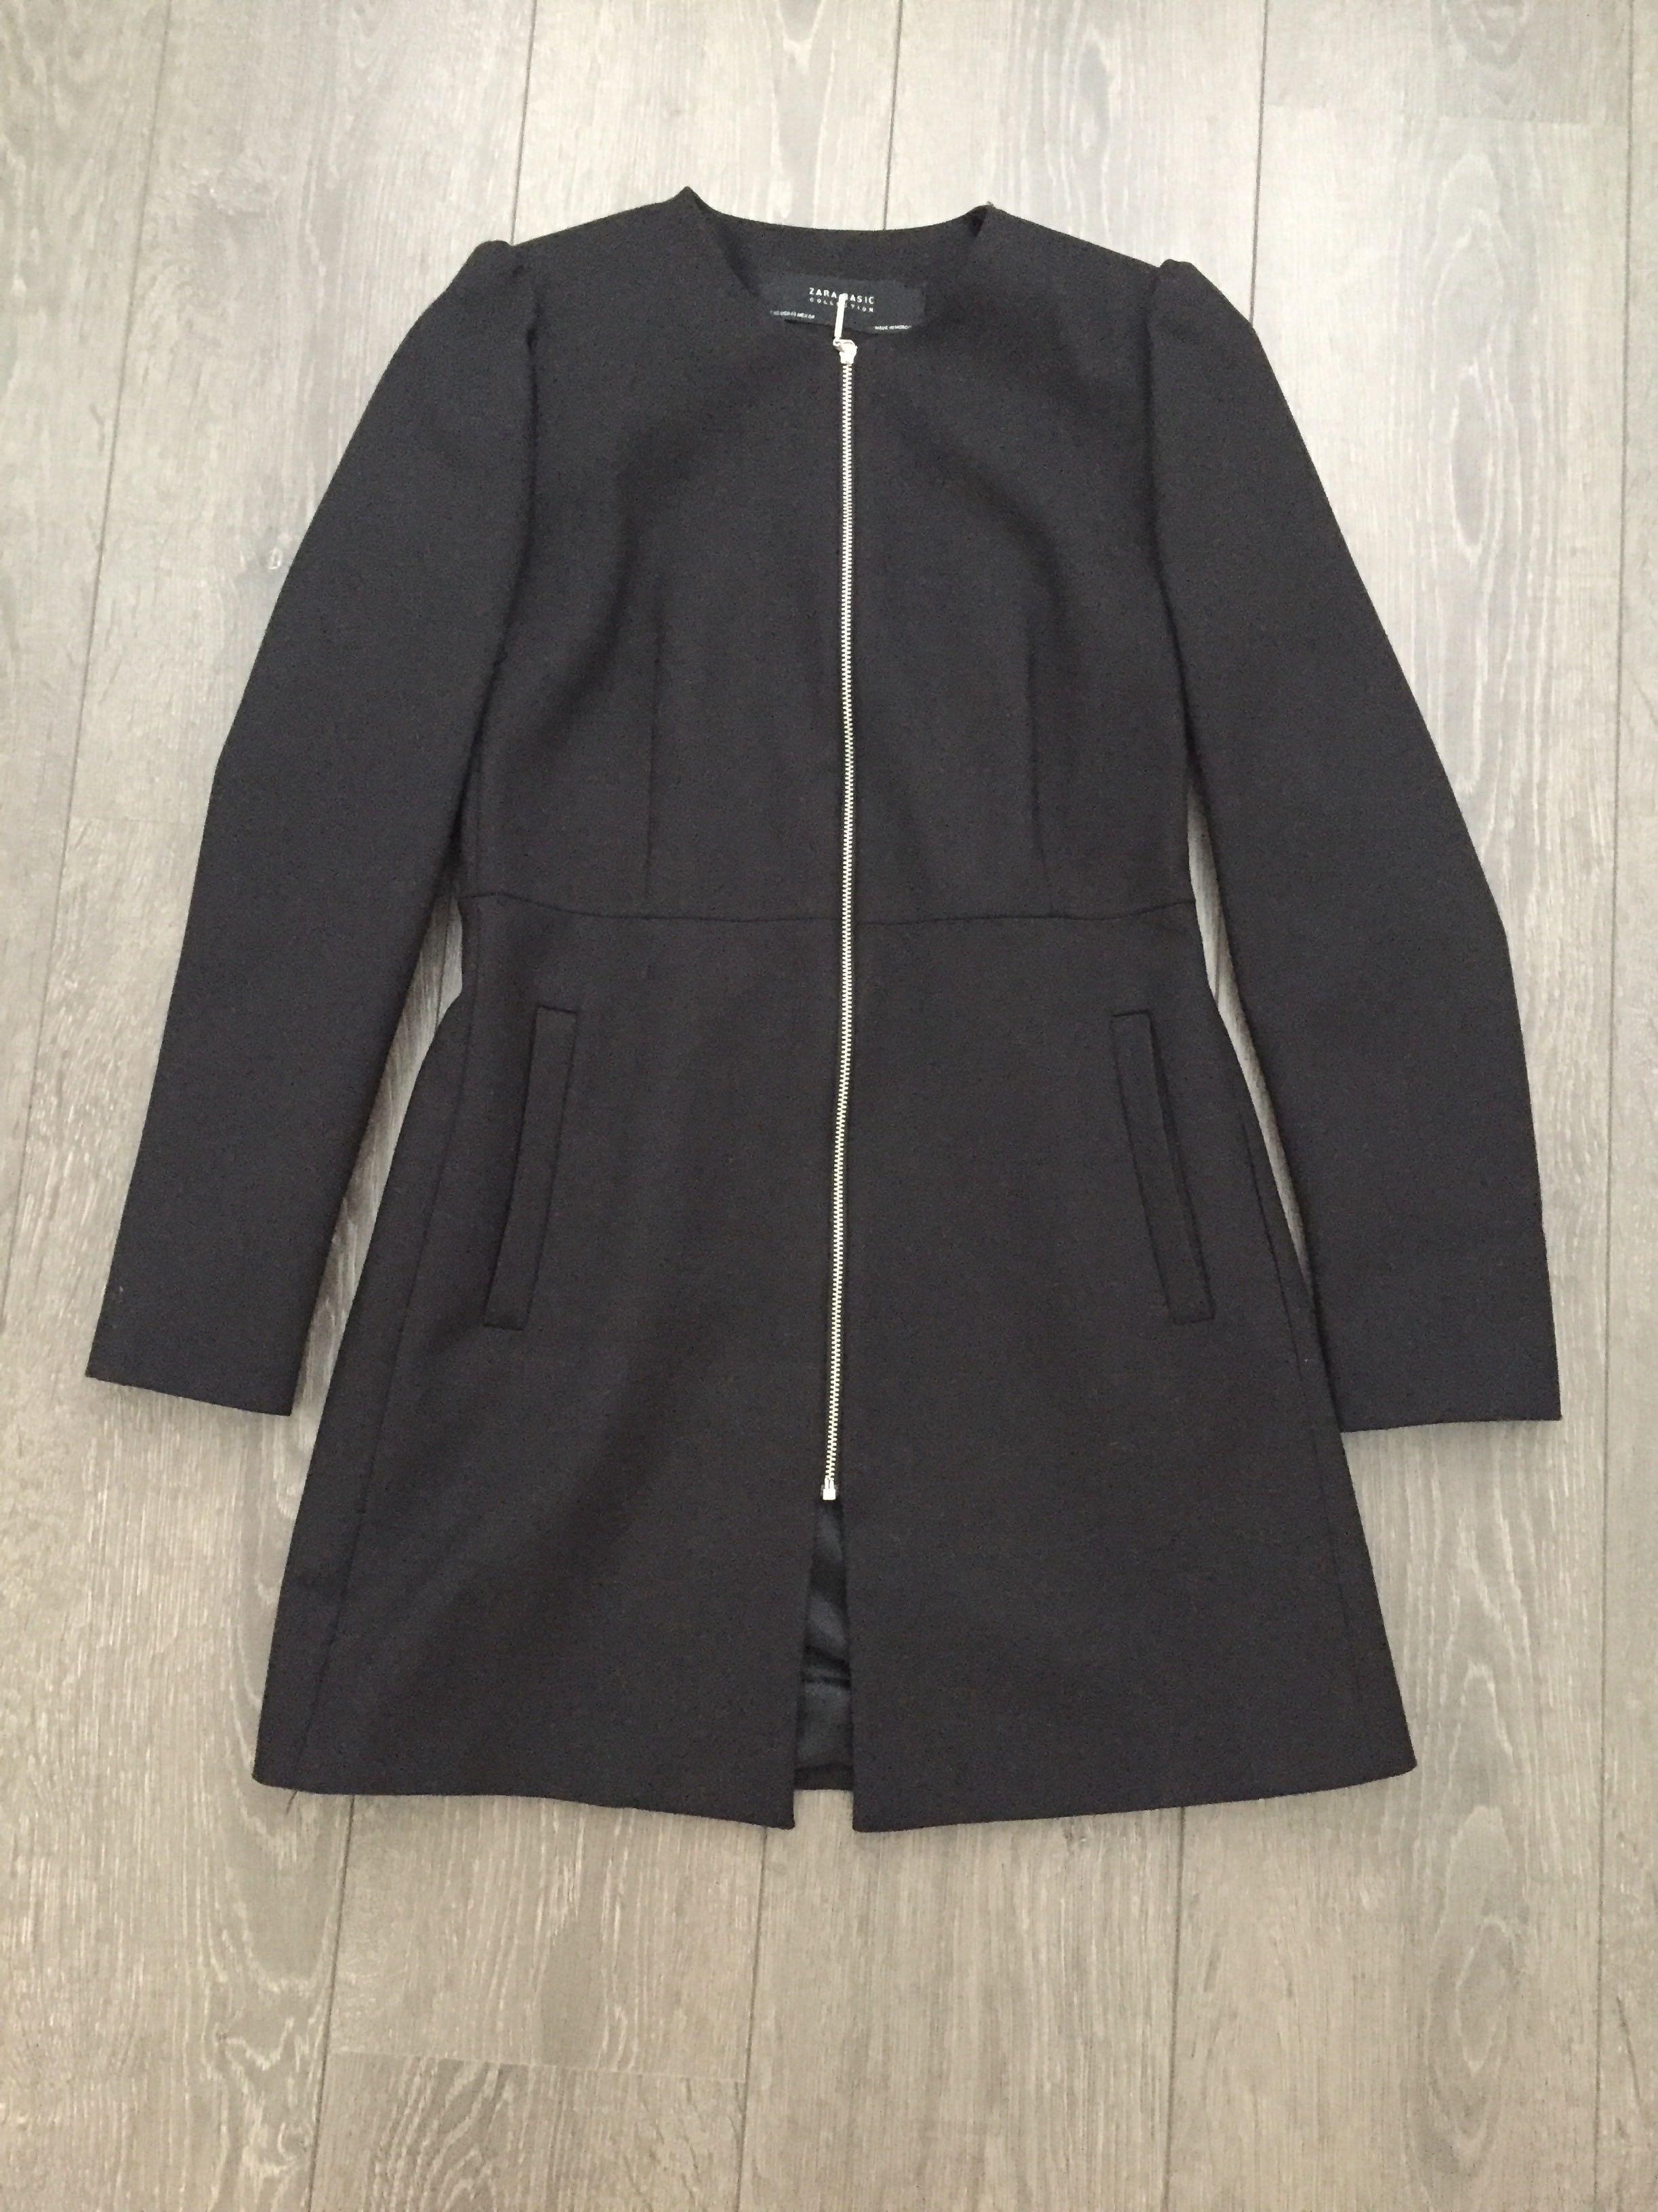 a12f13c2 Brand New Zara Puff Sleeves Coat Black Size XS, Women's Fashion ...